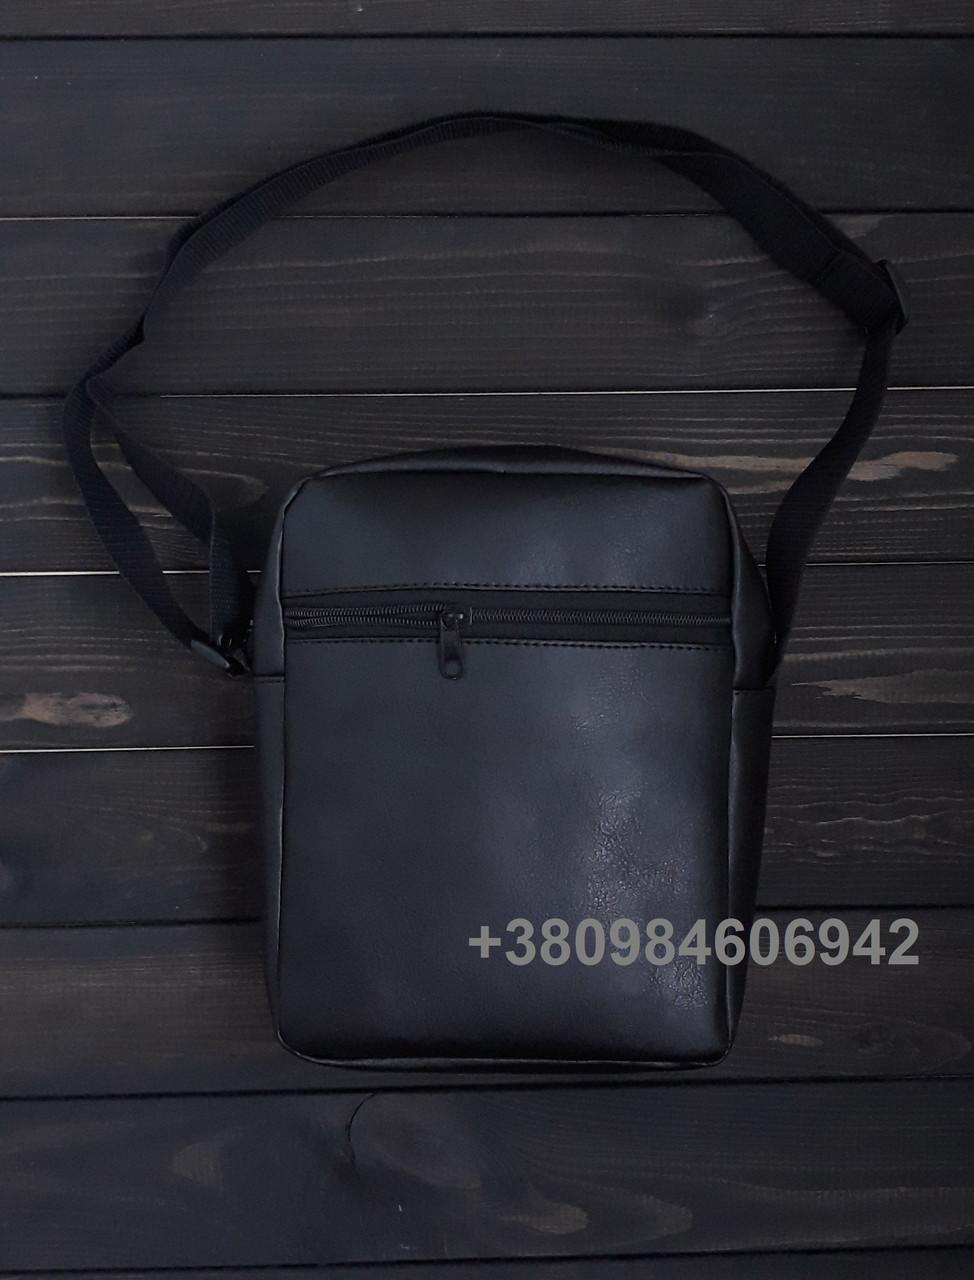 14c8f6aa ОПТ. Мужская сумка Nike Reebok через плечо / Барсетка / Спортивная ...